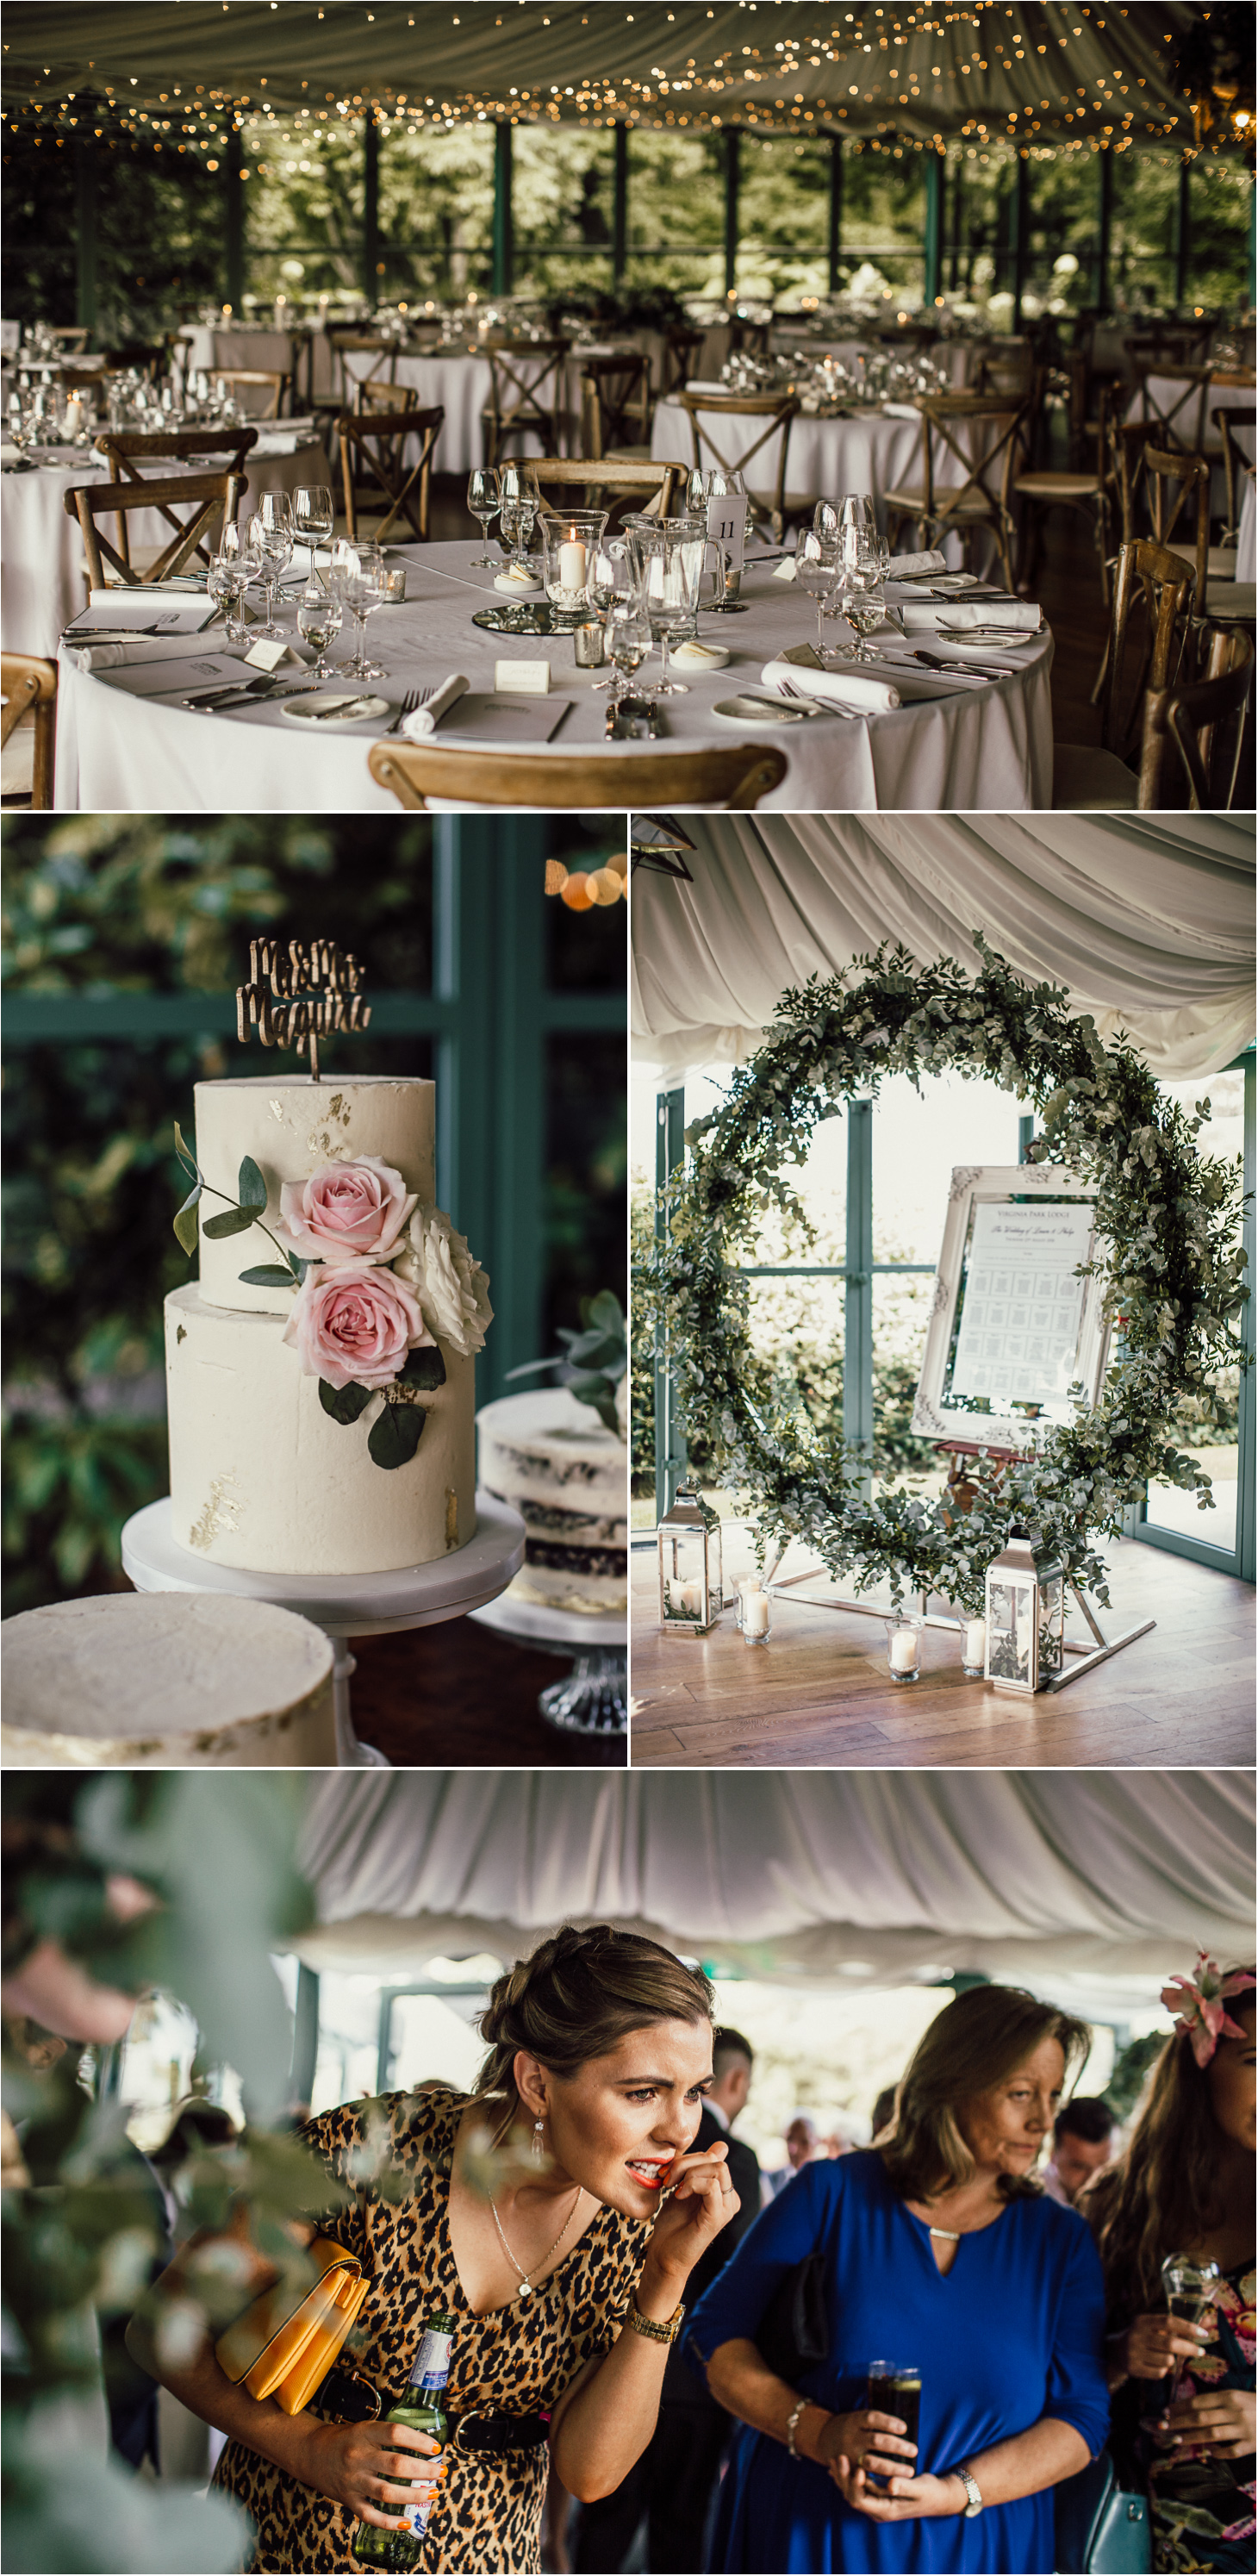 Virgina Lodge Photography. darren fitzpatrick. Wedding.24